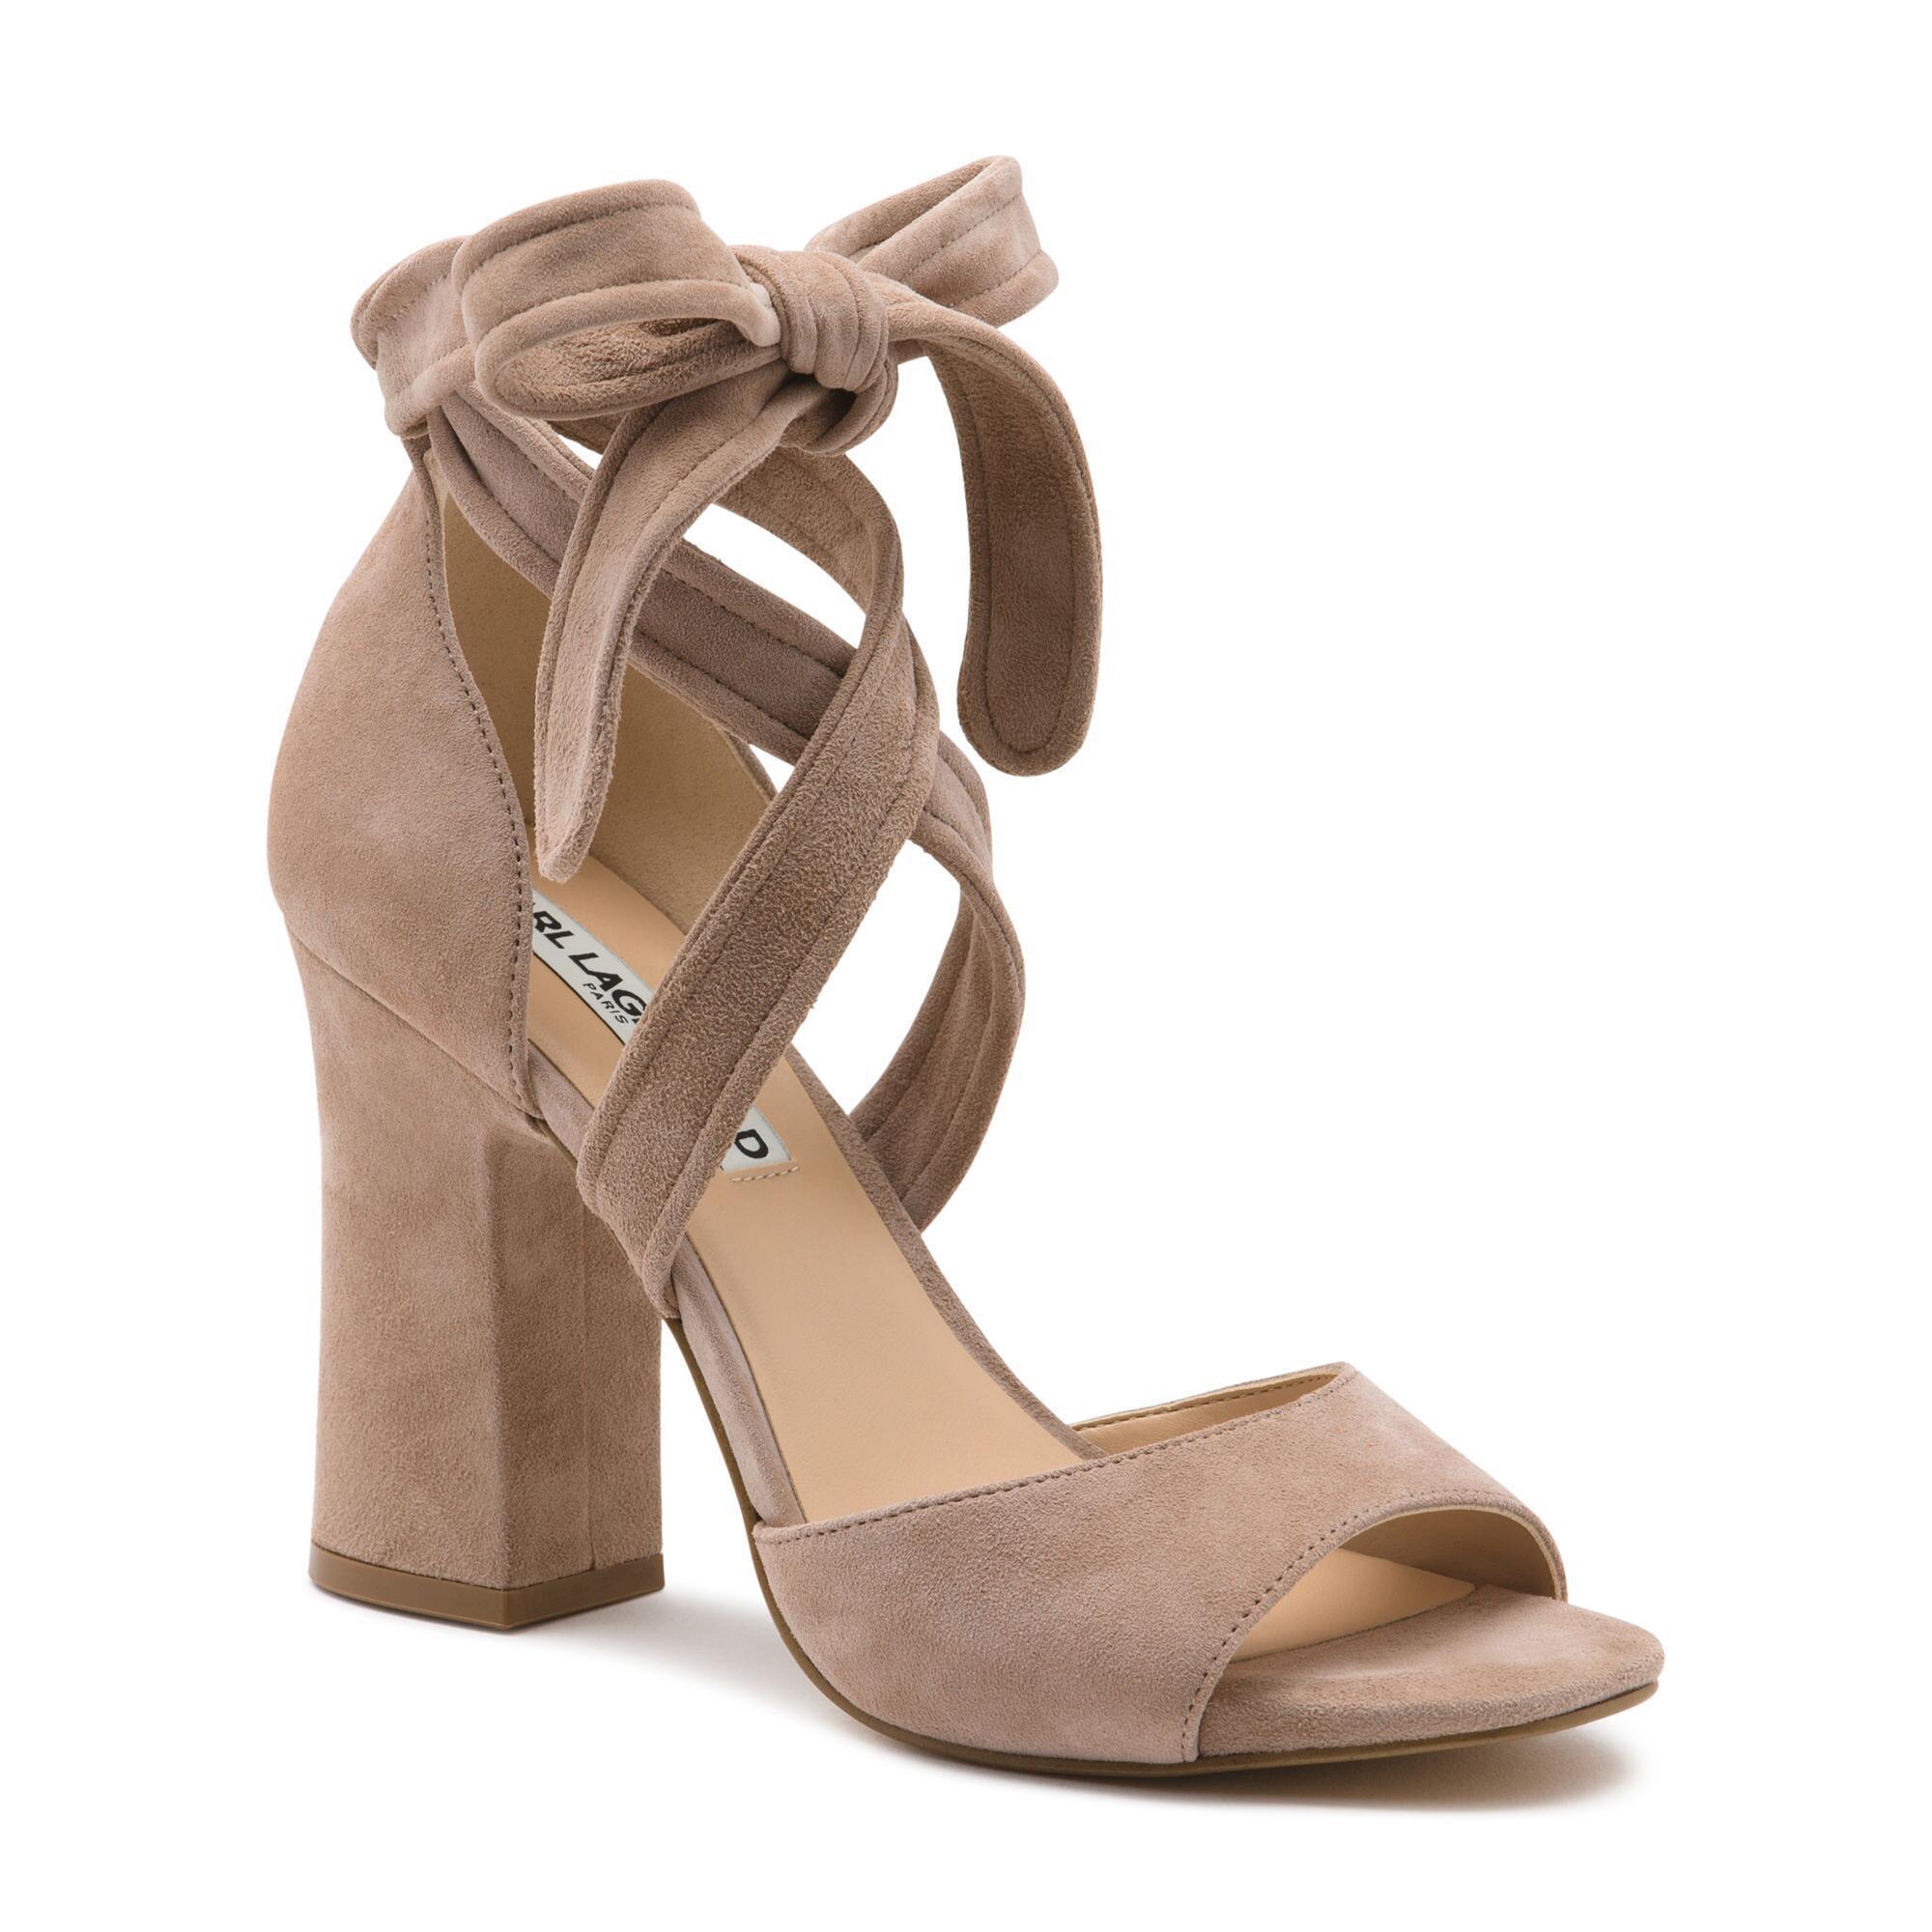 1bbecf486ae3 Lyst - Karl Lagerfeld Racha Wrap Tie Dress Sandal